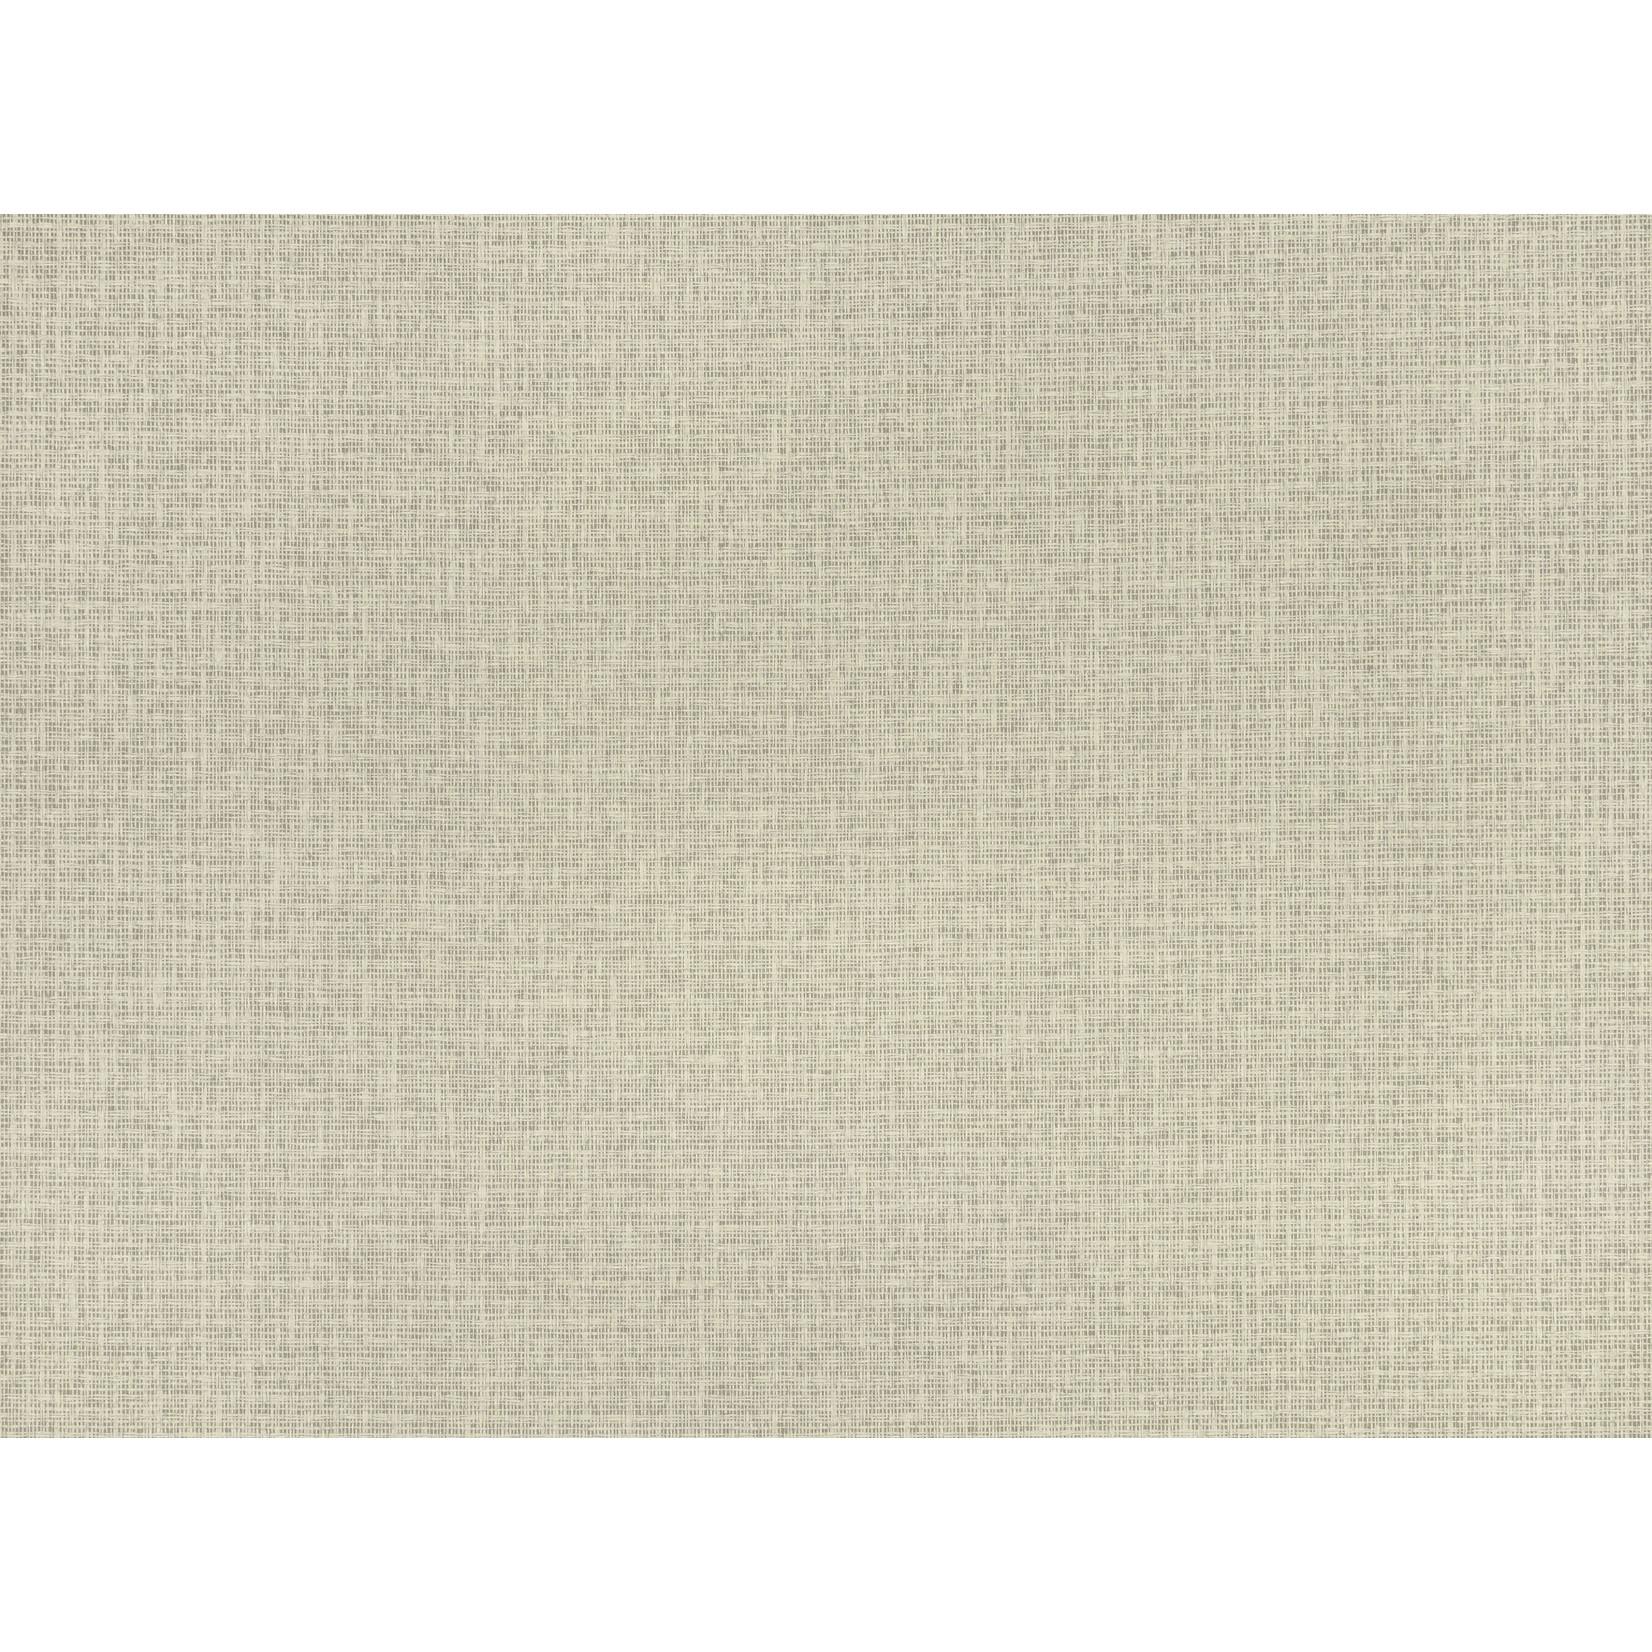 Mark Alexander Paperweave Handwoven Wallcoverings | Shifu Almond